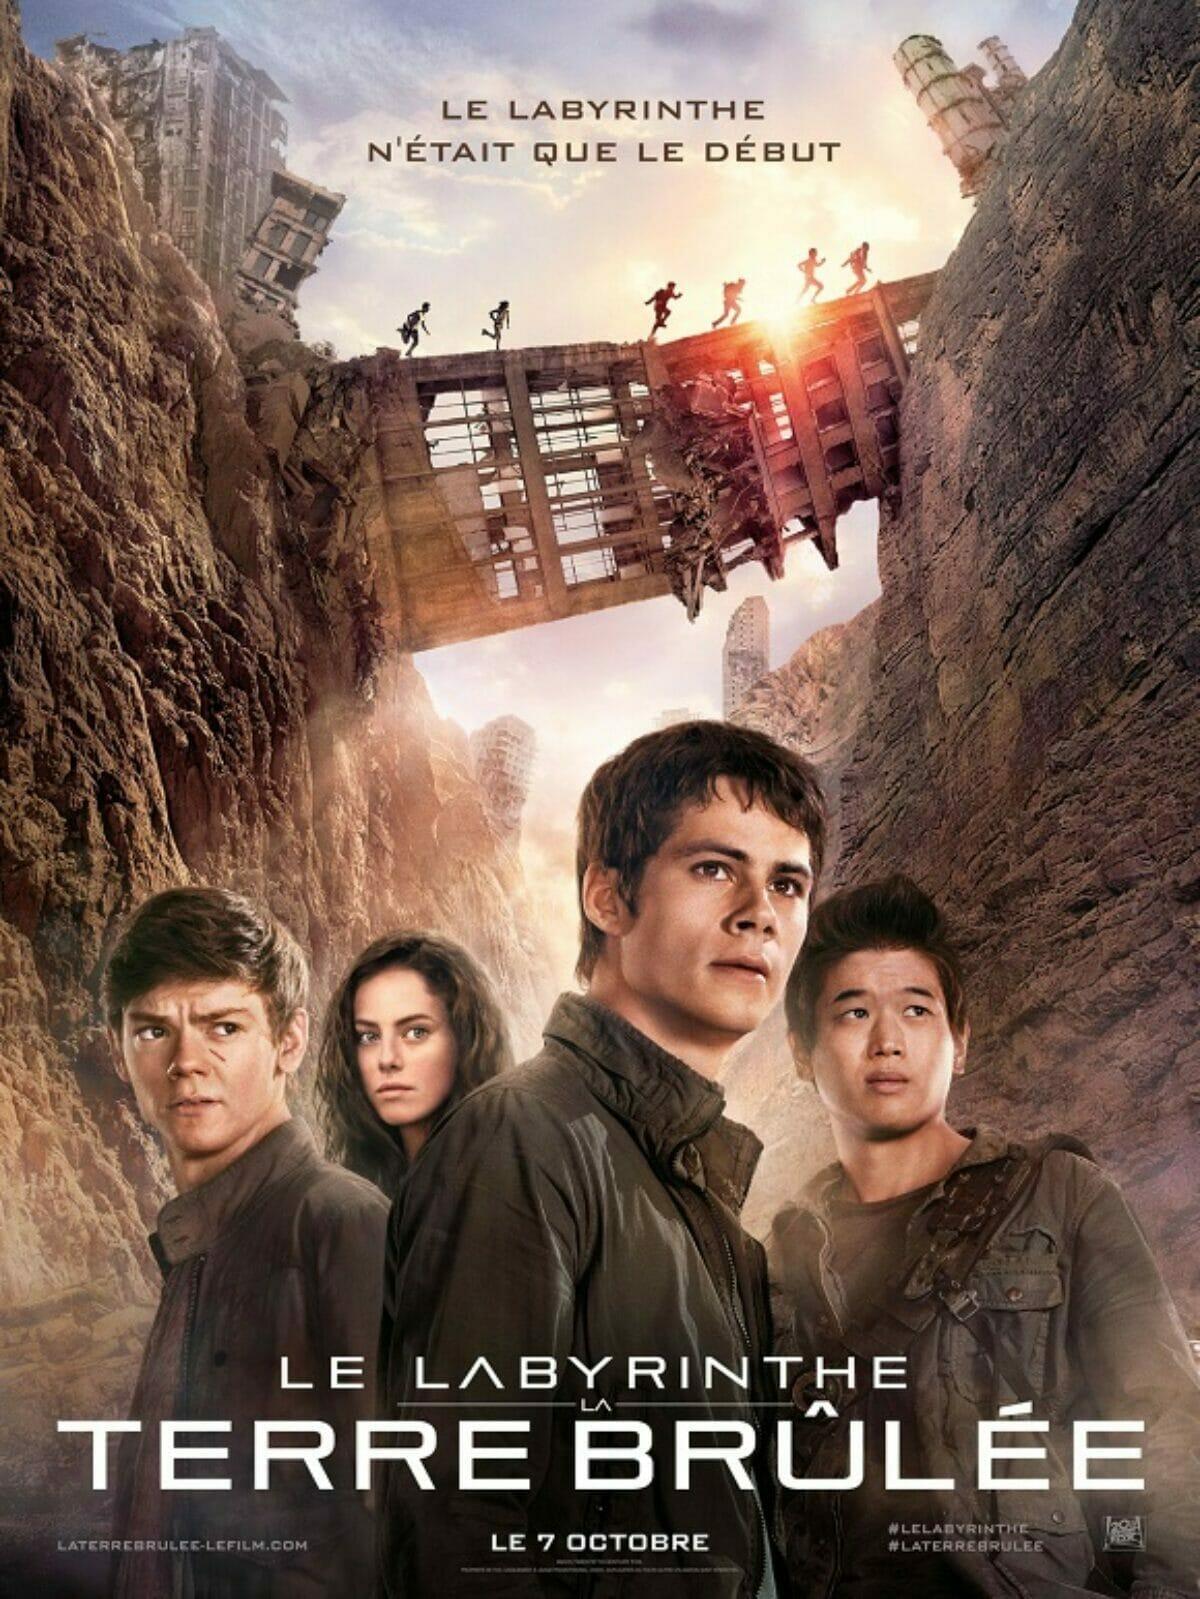 Le-Labyrinthe-Terre-Brûlée-poster